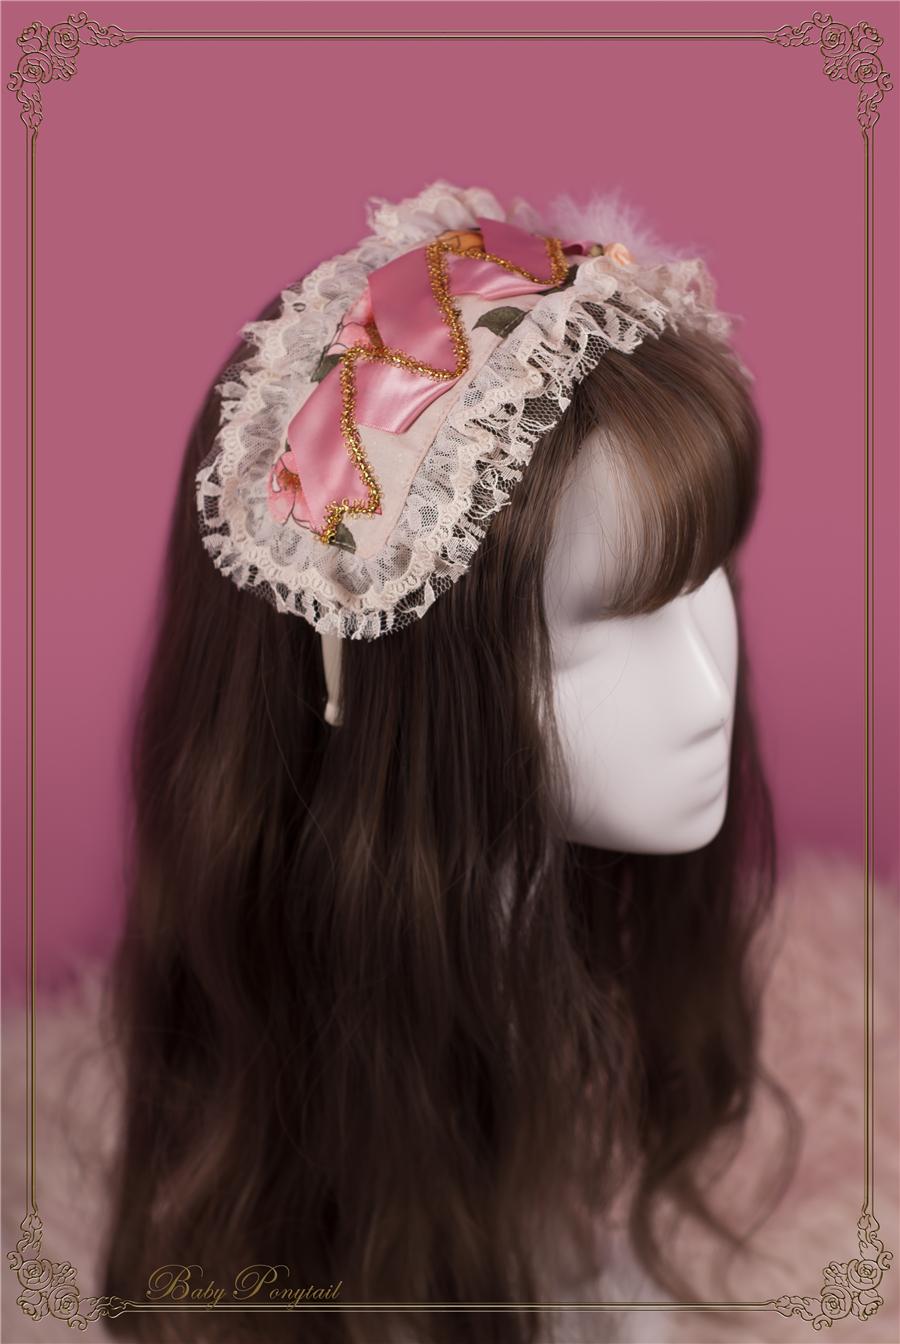 Babyponytail_Accessory_Tassel Head Dress_3.jpg